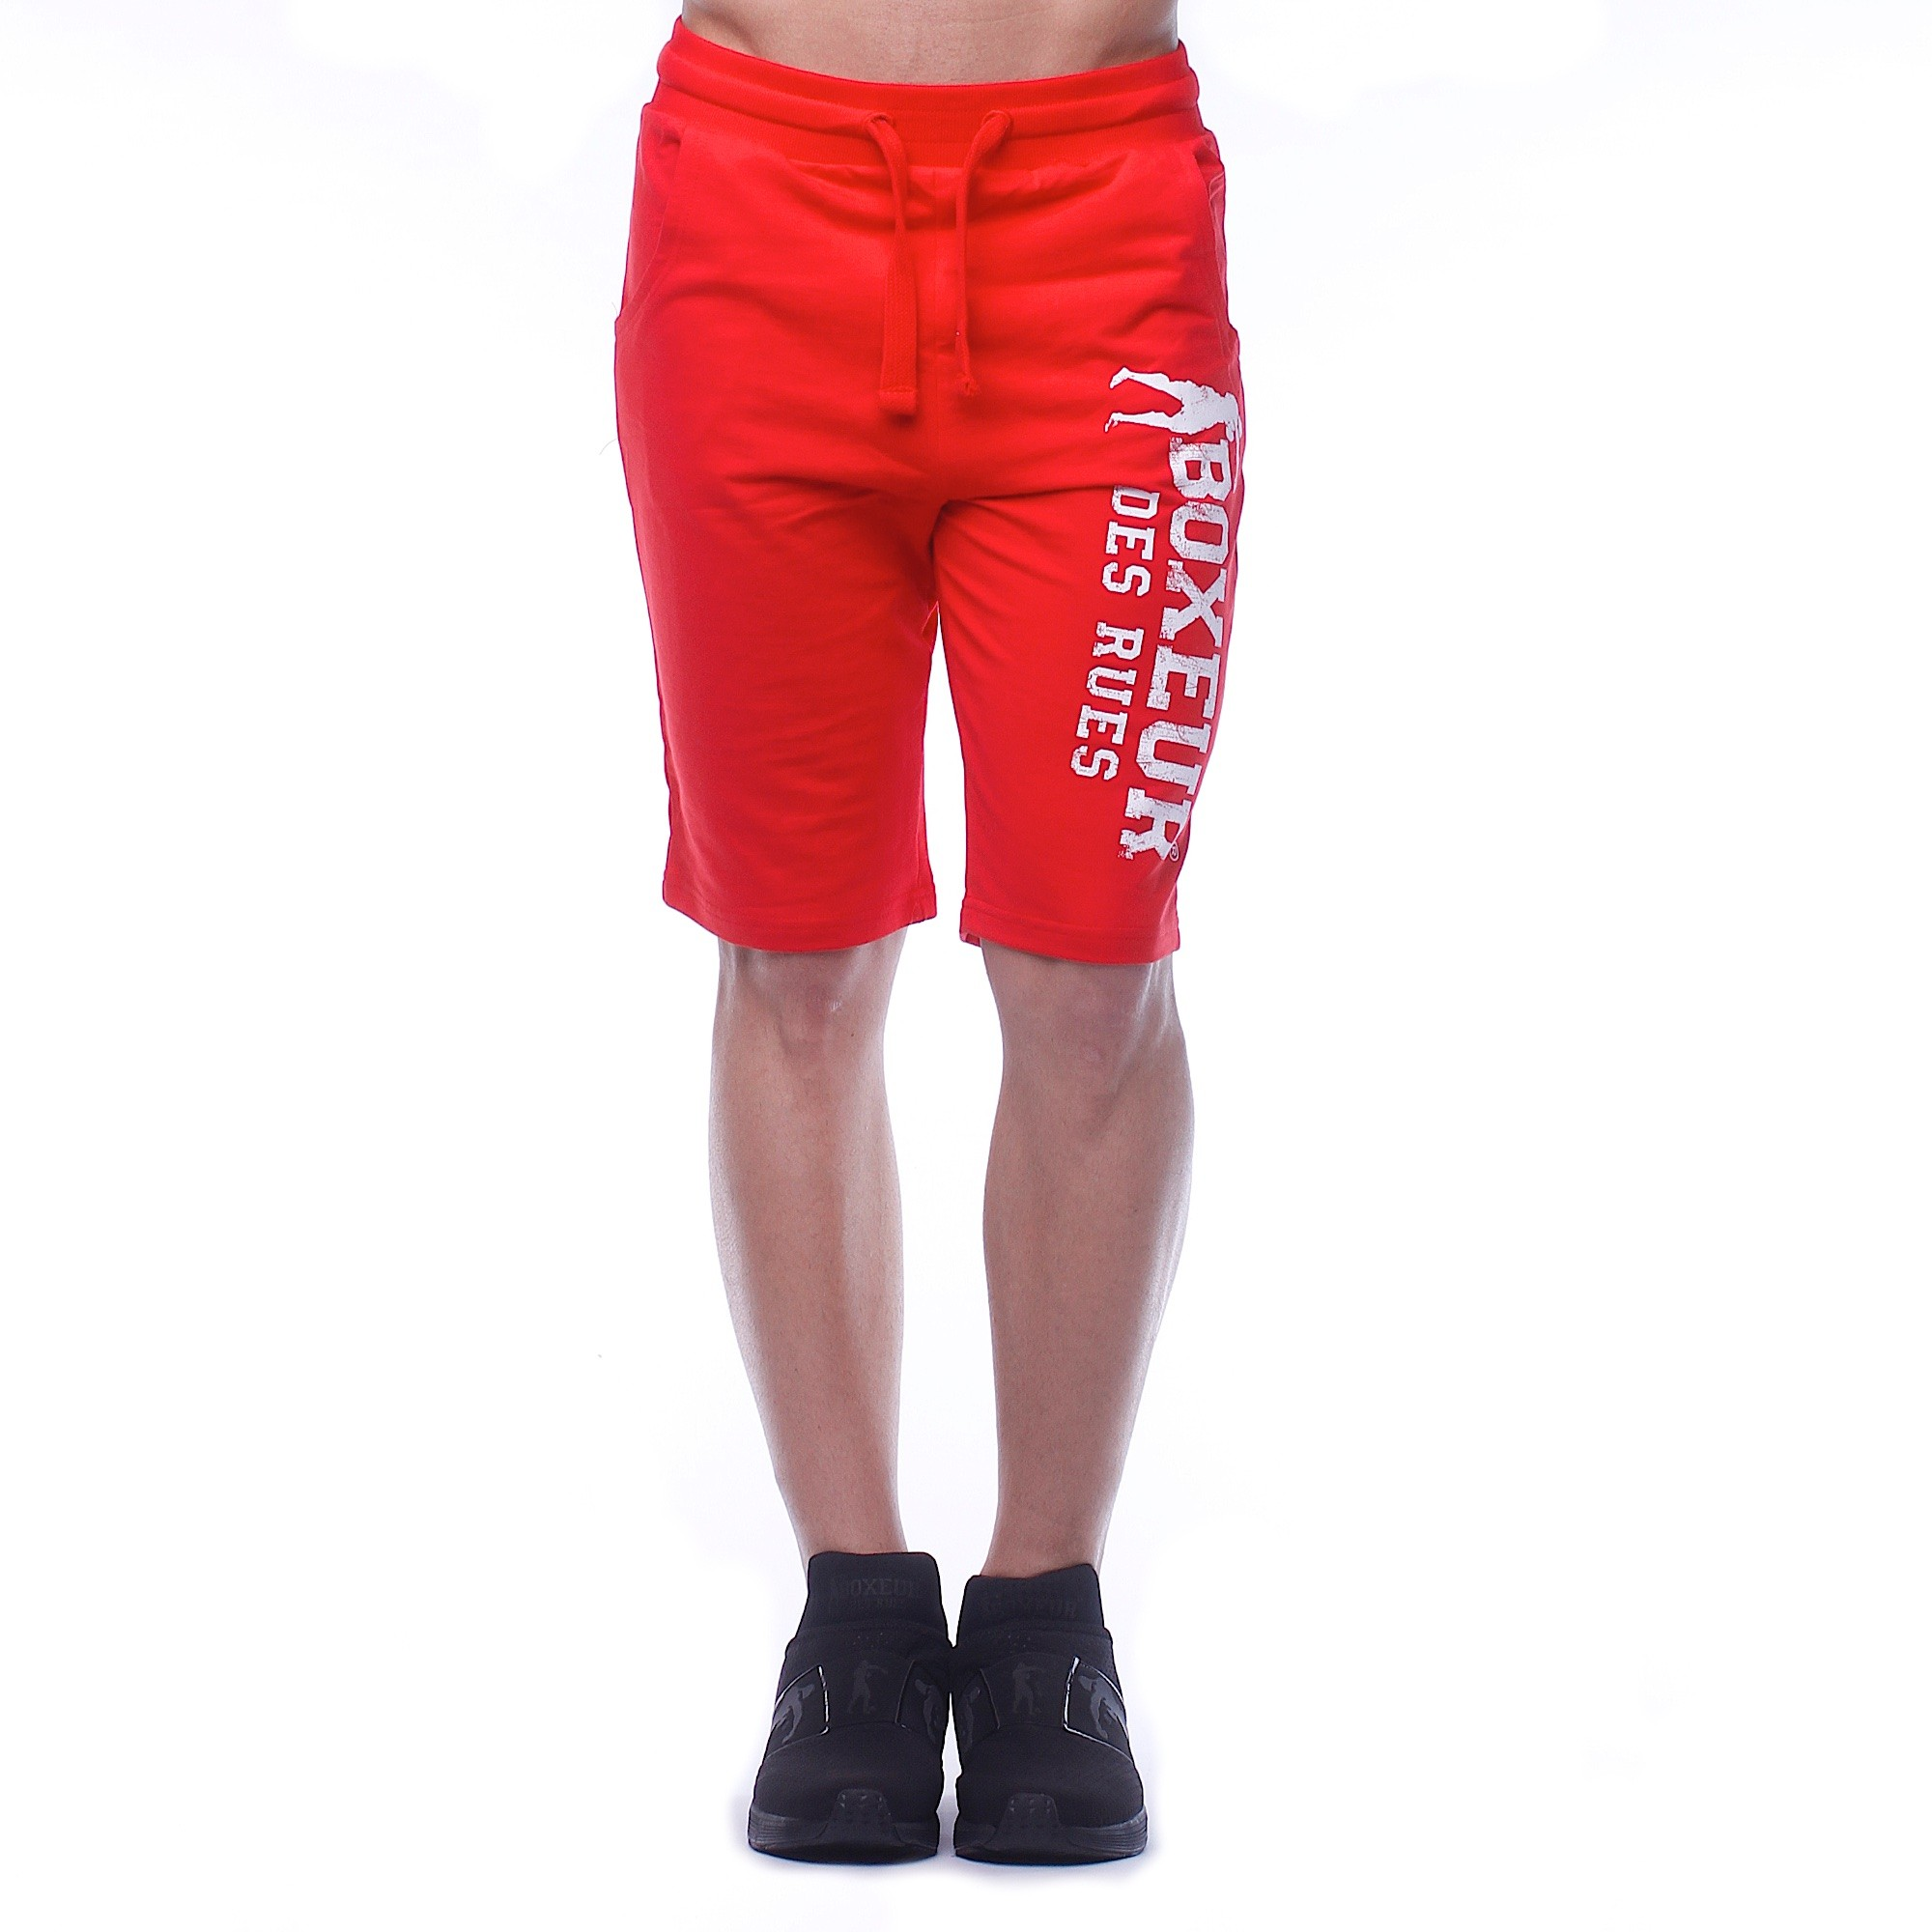 Boxeur SHORT SWEATPANTS, moške fitnes hlače, rdeča